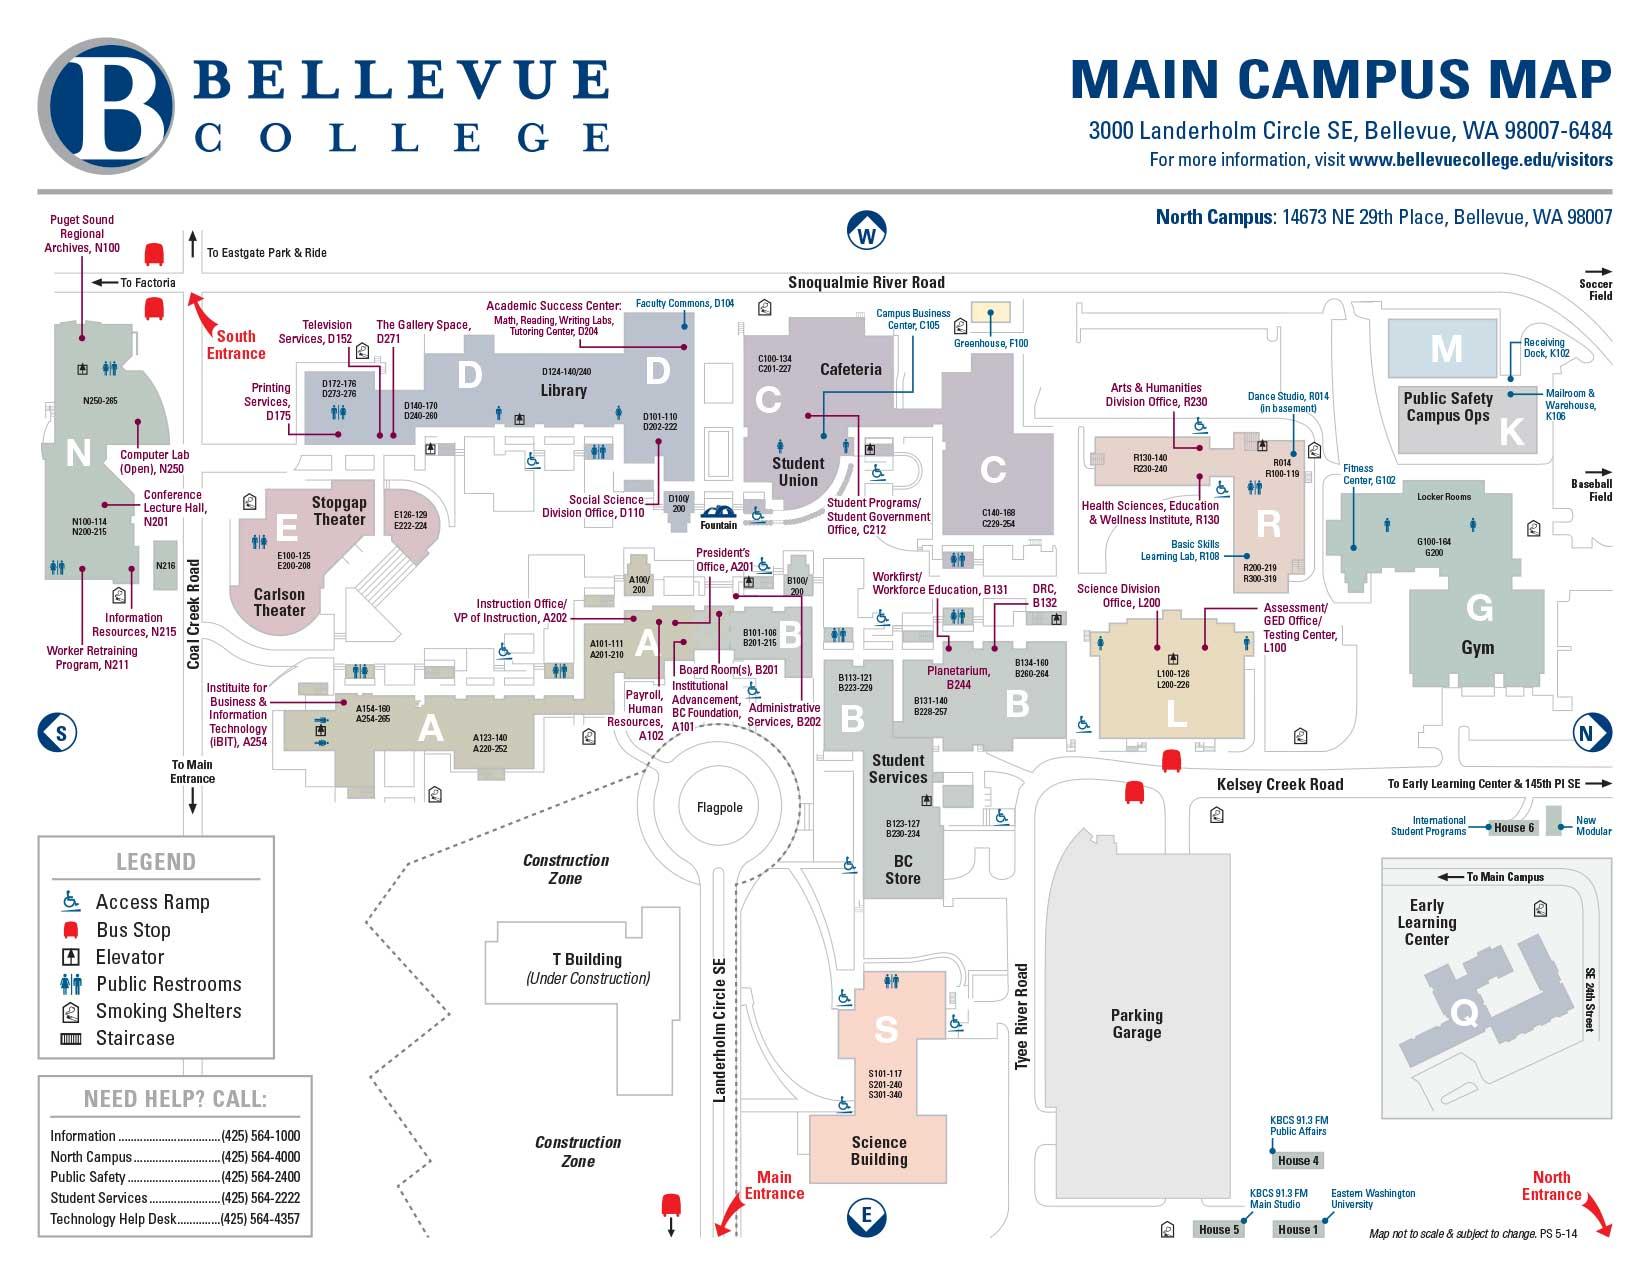 Wartburg College Campus Map.Ctc Campus Map Bikini Atoll Map Cwru Campus Map